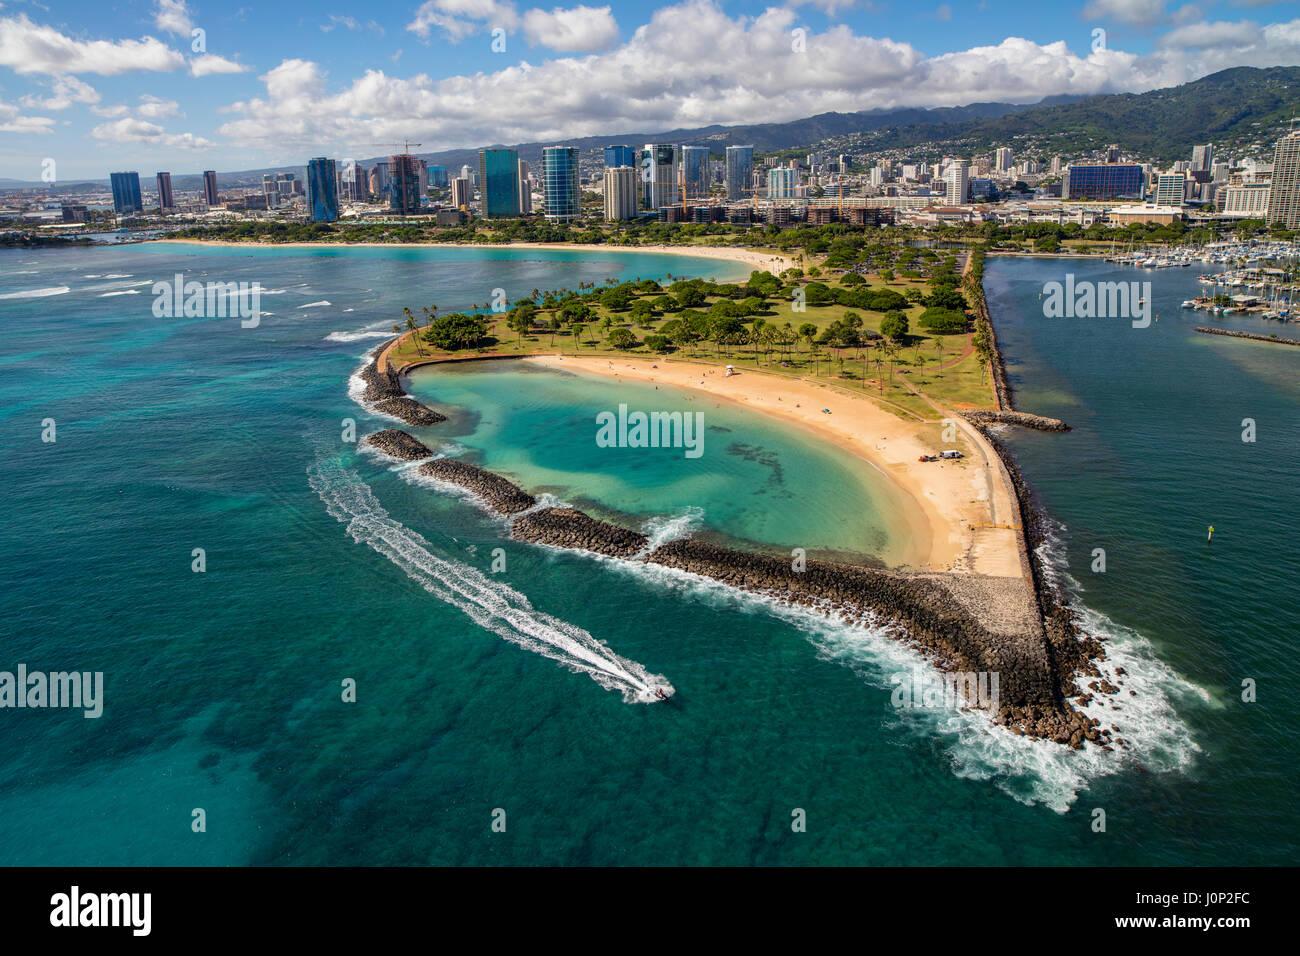 Ala Moana Beach Park Magic Island Hawaii